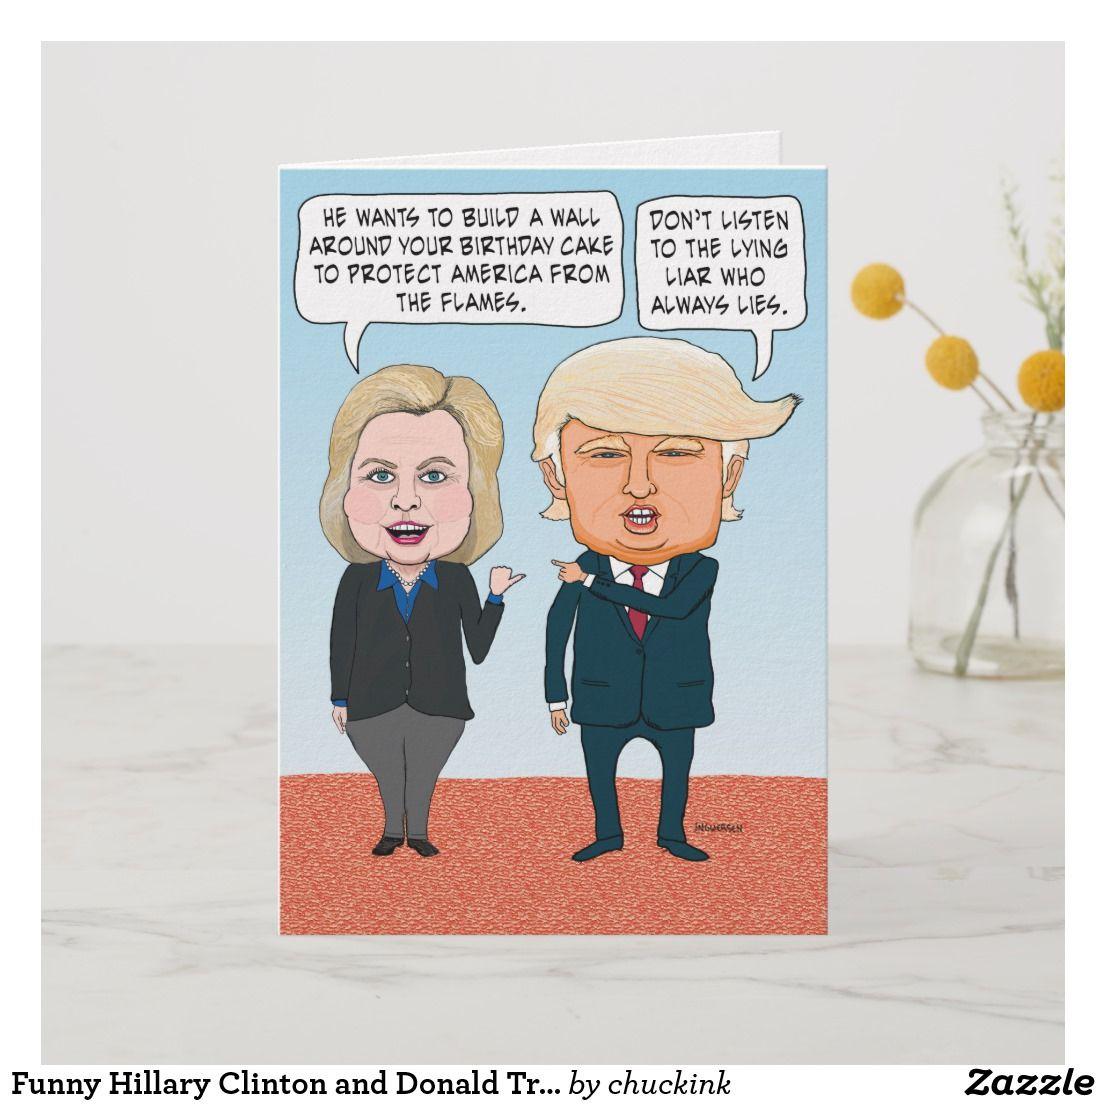 Funny Hillary Clinton And Donald Trump Birthday Card Cardsfunny Cardsgreeting Cardshappy Cardbirthday Greeting Cardsonline